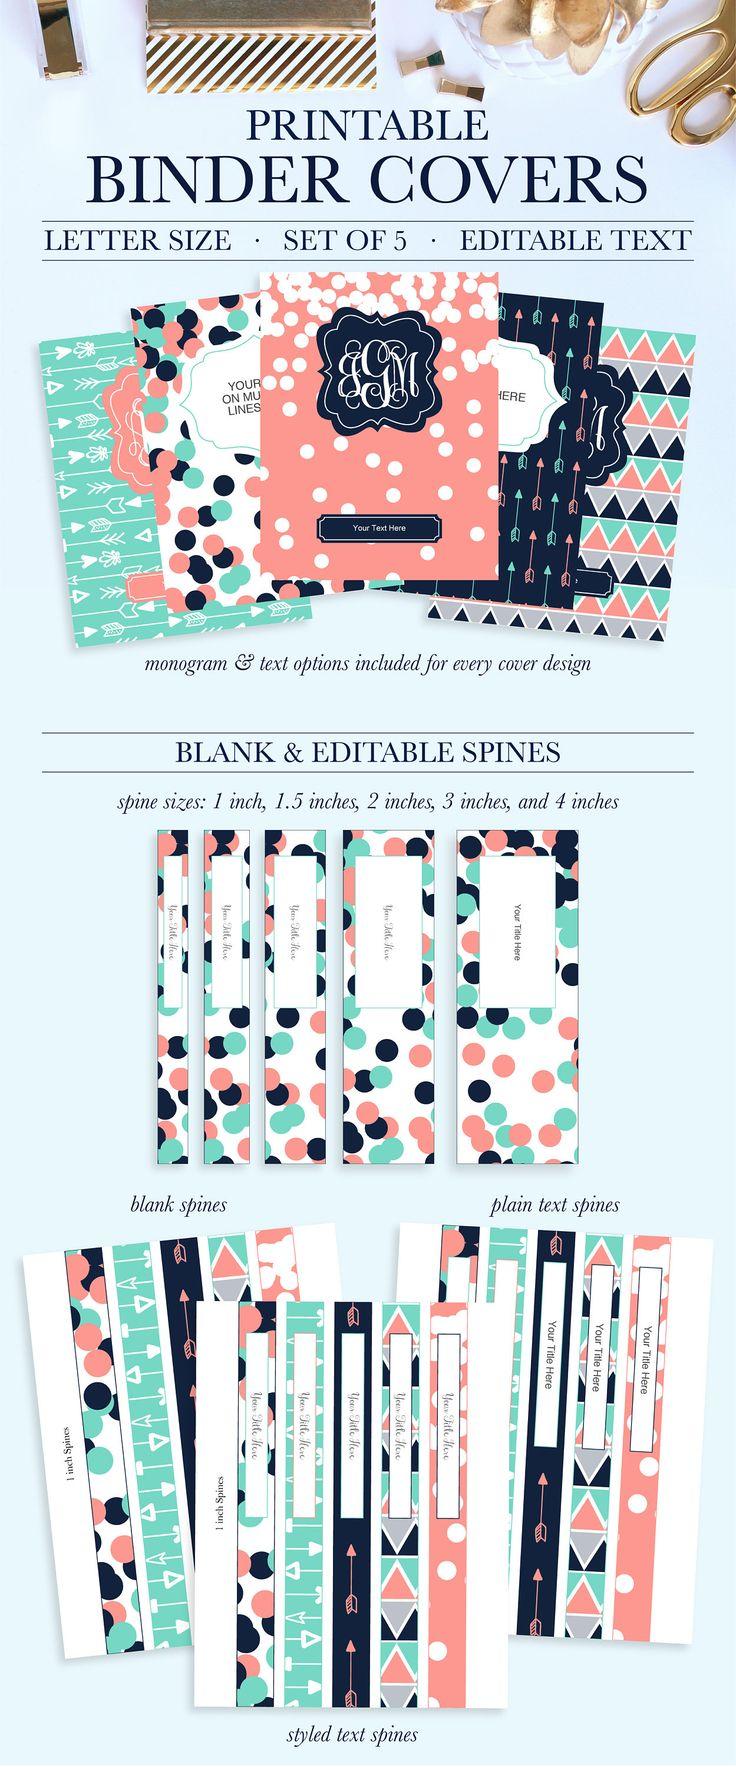 Monogram Binder Covers Student Printable Binder Covers and